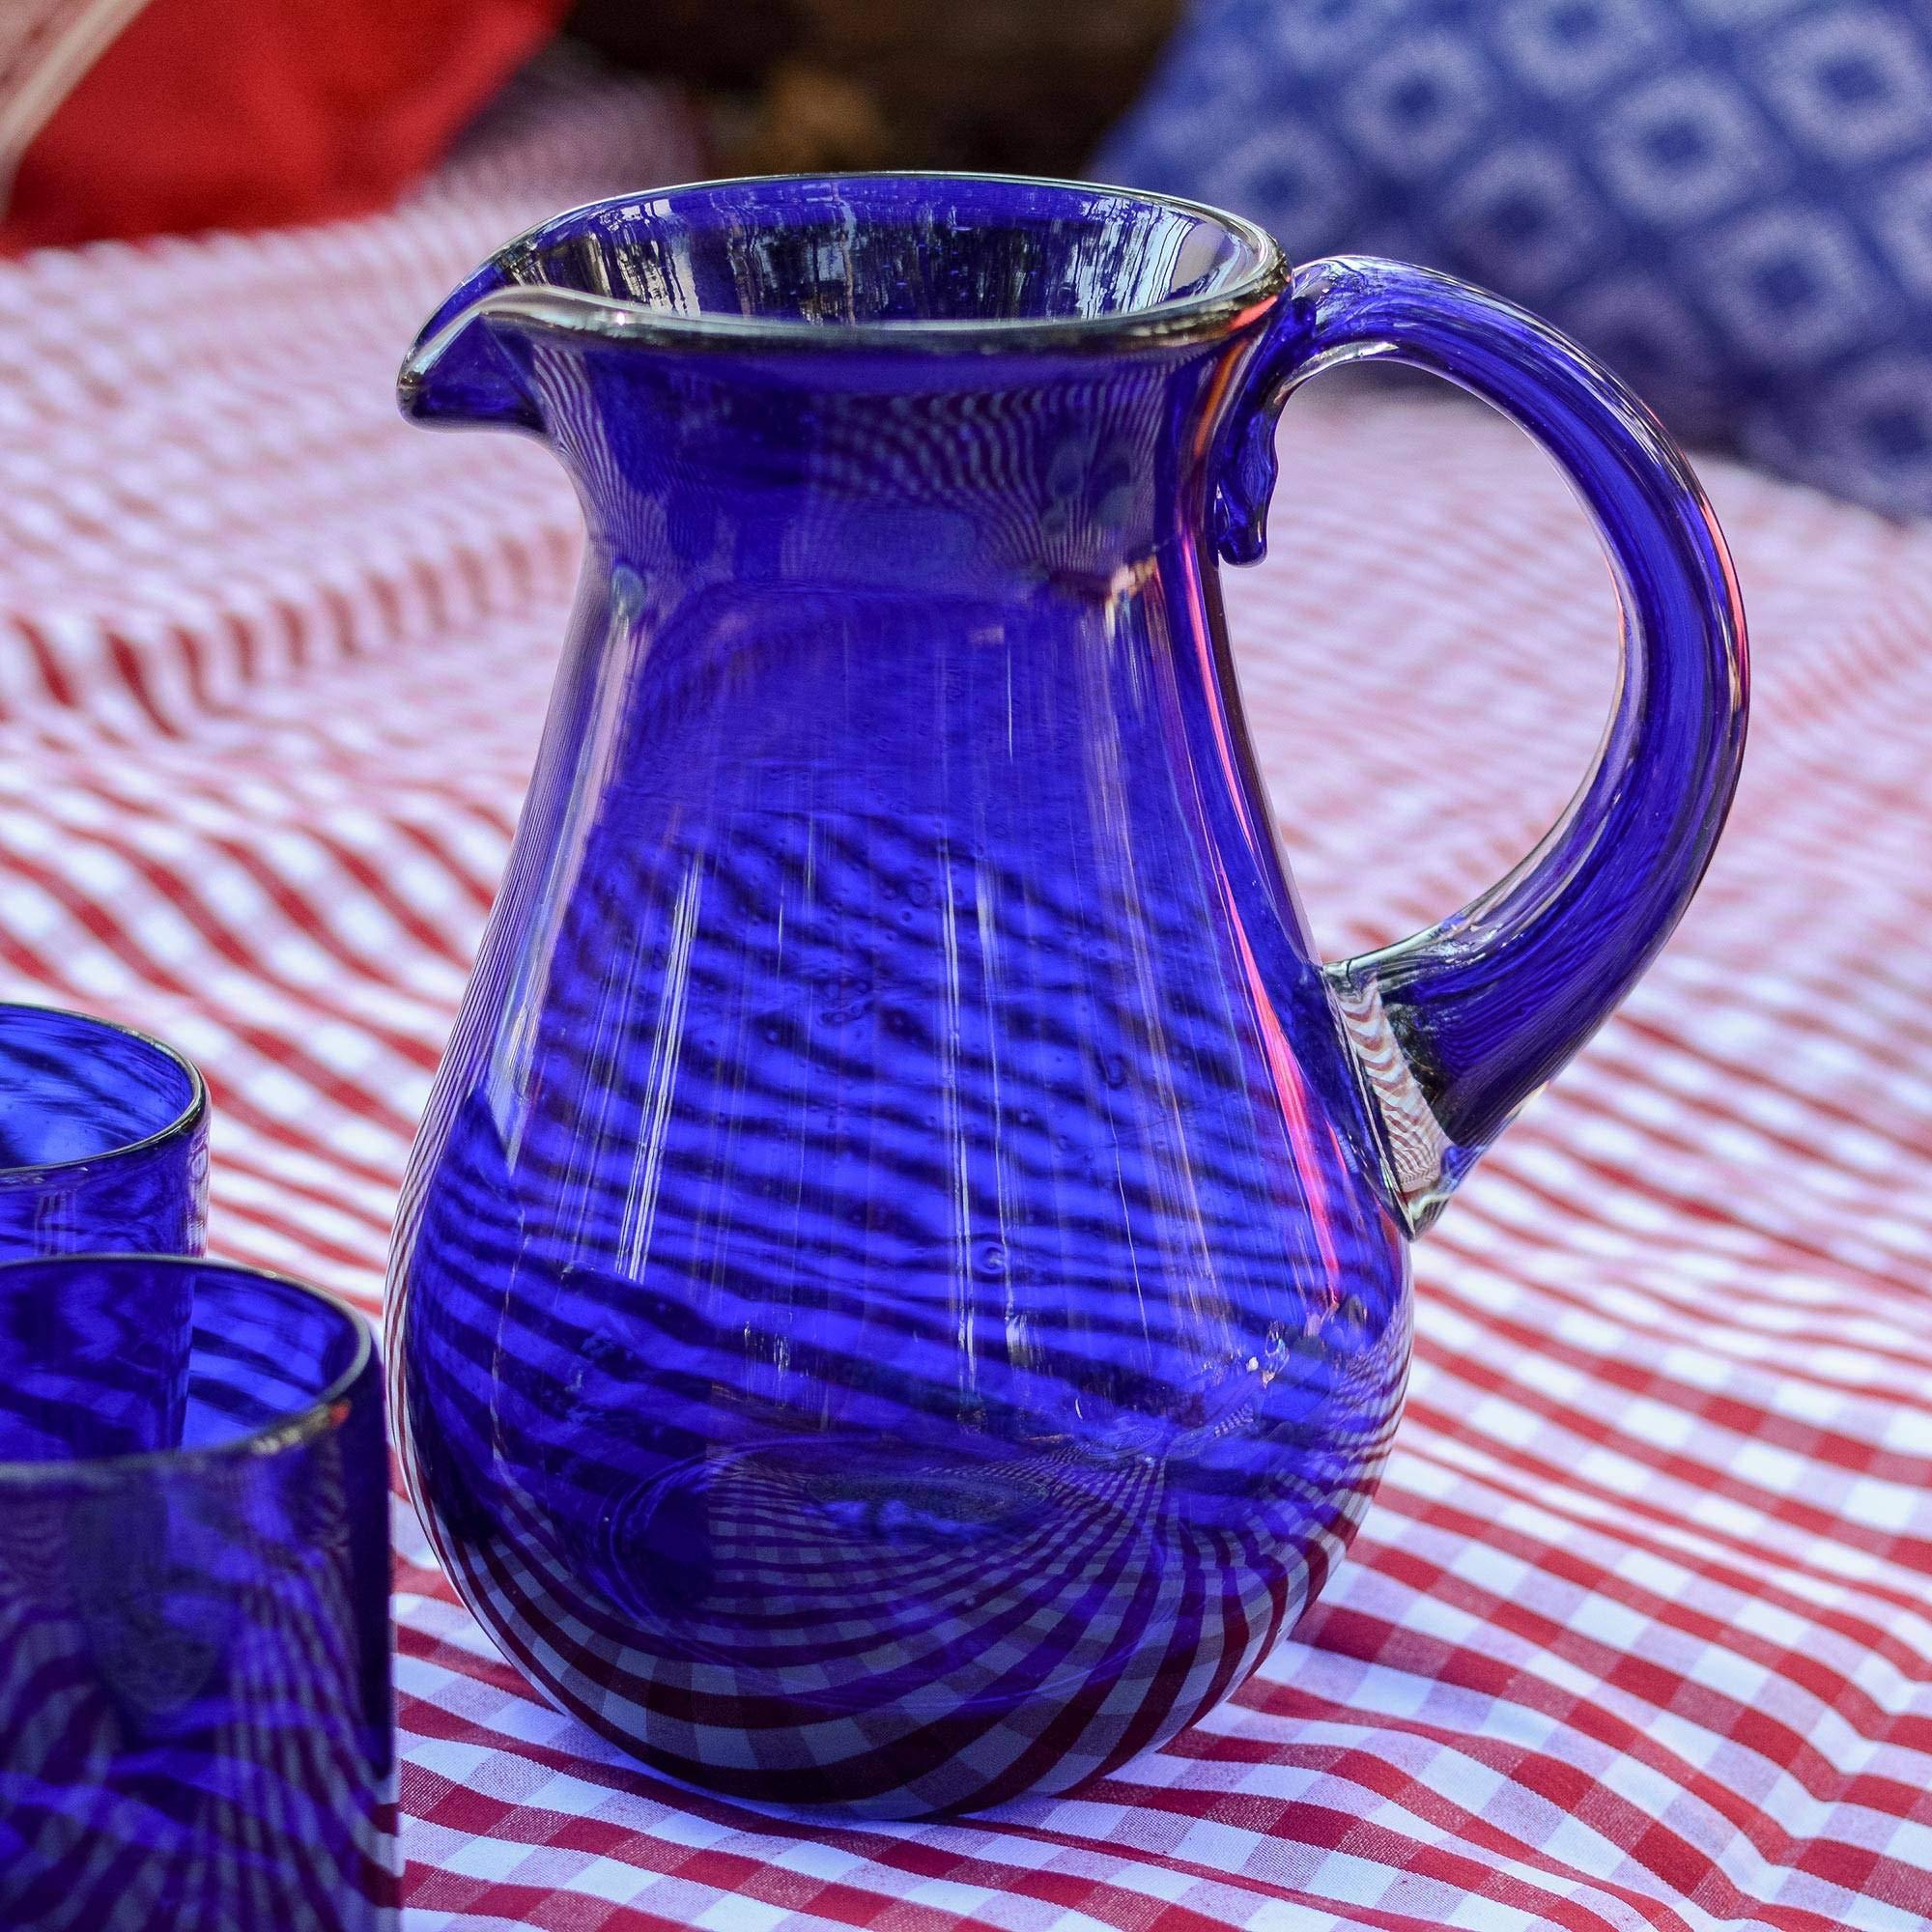 NOVICA Large Blue Hand Blown Glass Pitcher for Water, Margaritas, Lemonade, 82 oz, 'Cobalt Charm' by NOVICA (Image #4)